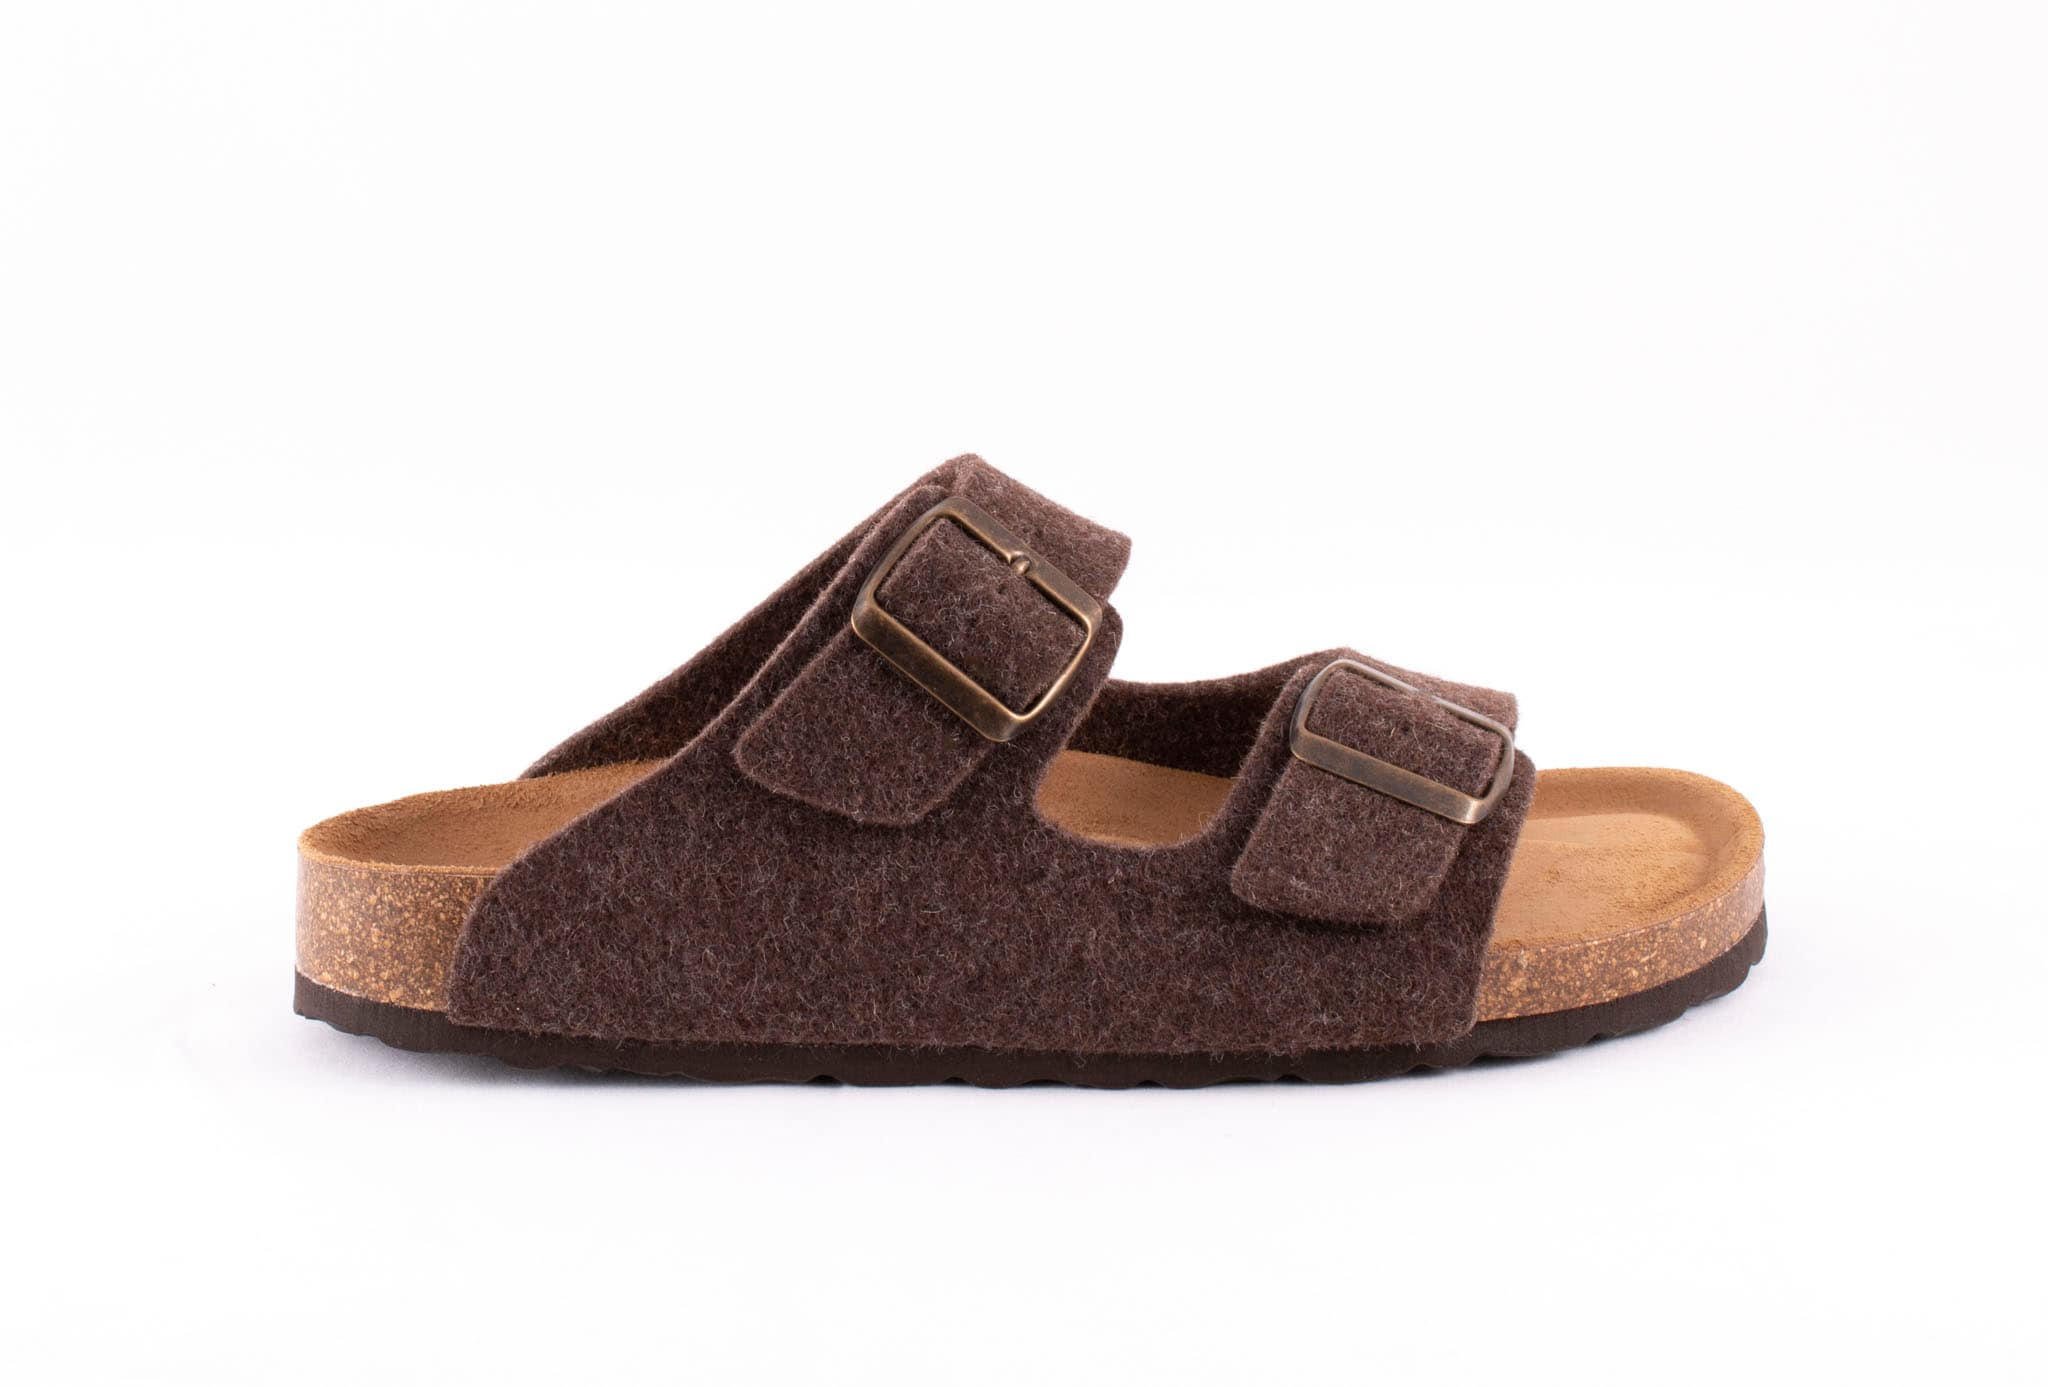 Mikael wool sandals